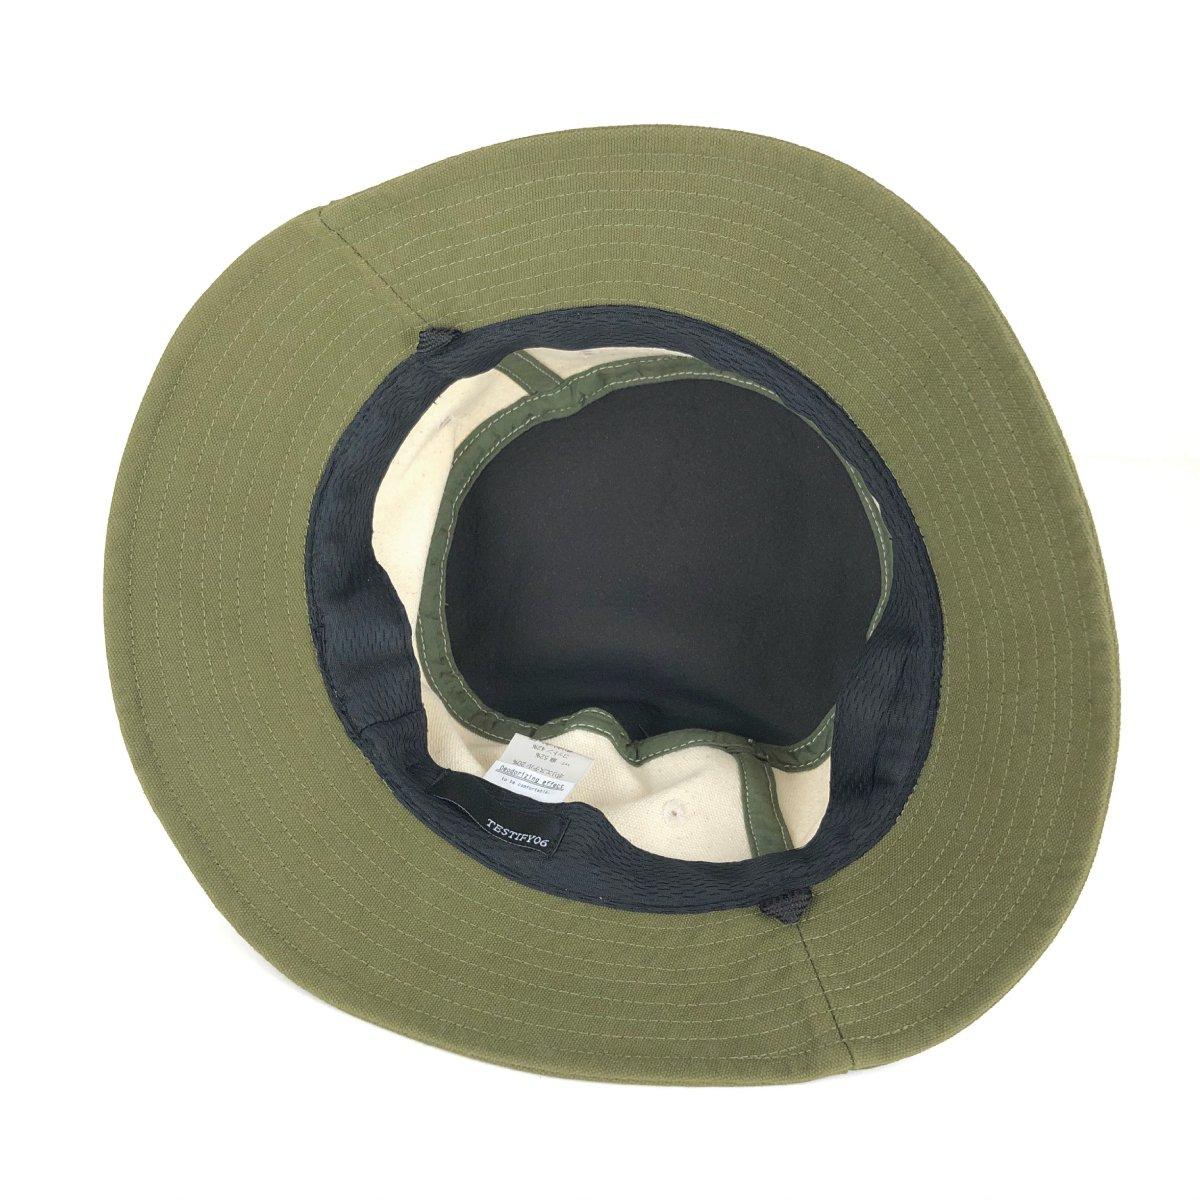 Repro Hat 詳細画像6